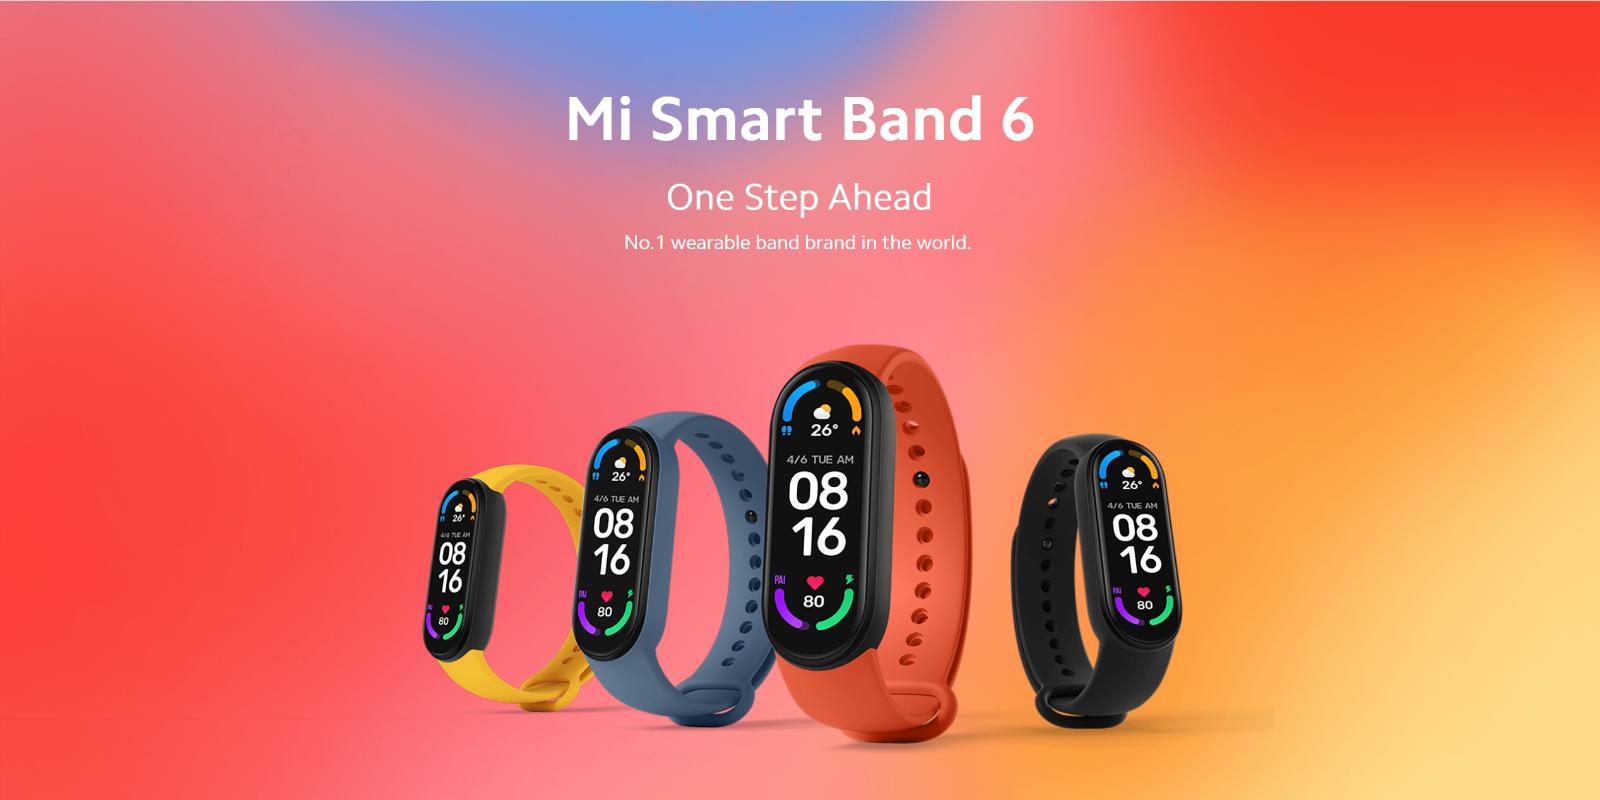 Xiaomi Mi Band 6 1.56 AMOLED Blood Oxygen Fitness Tracker Heart Rate Monitor NFC amoled band blood fitness heart monitor oxygen rate tracker xiaomi